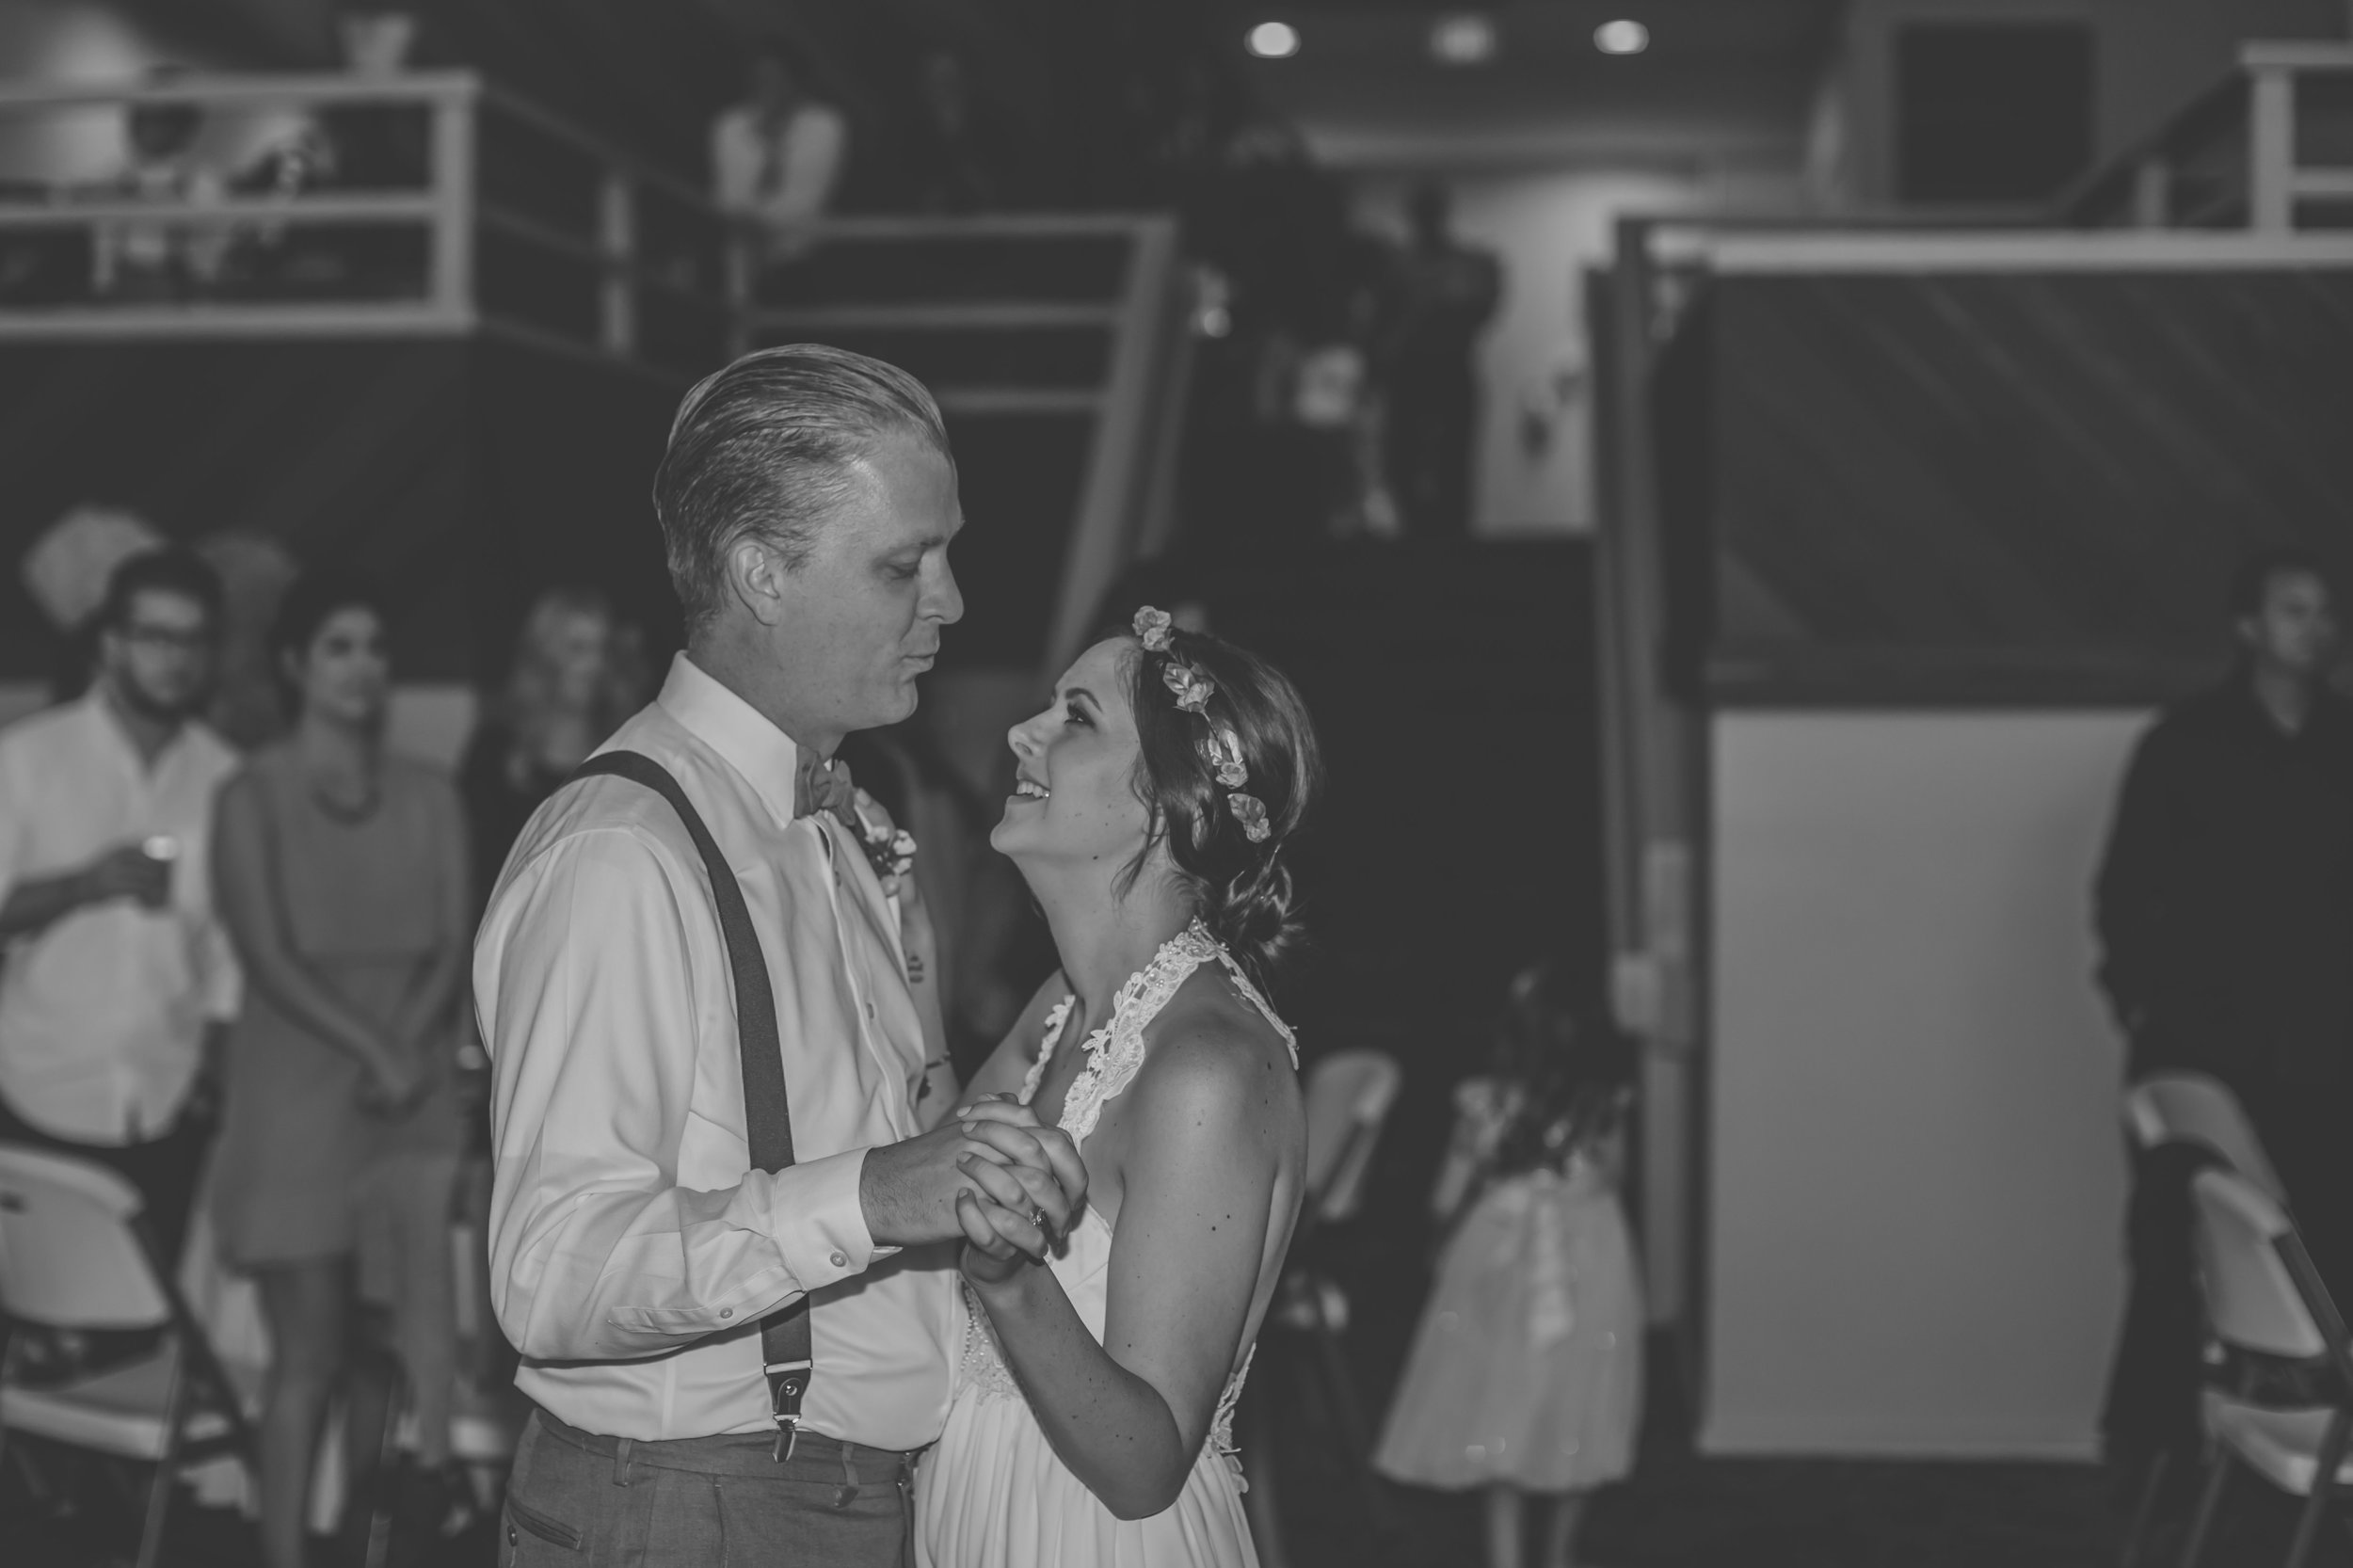 20141024-DePartee-Wedding-APavone-055-sm.jpg